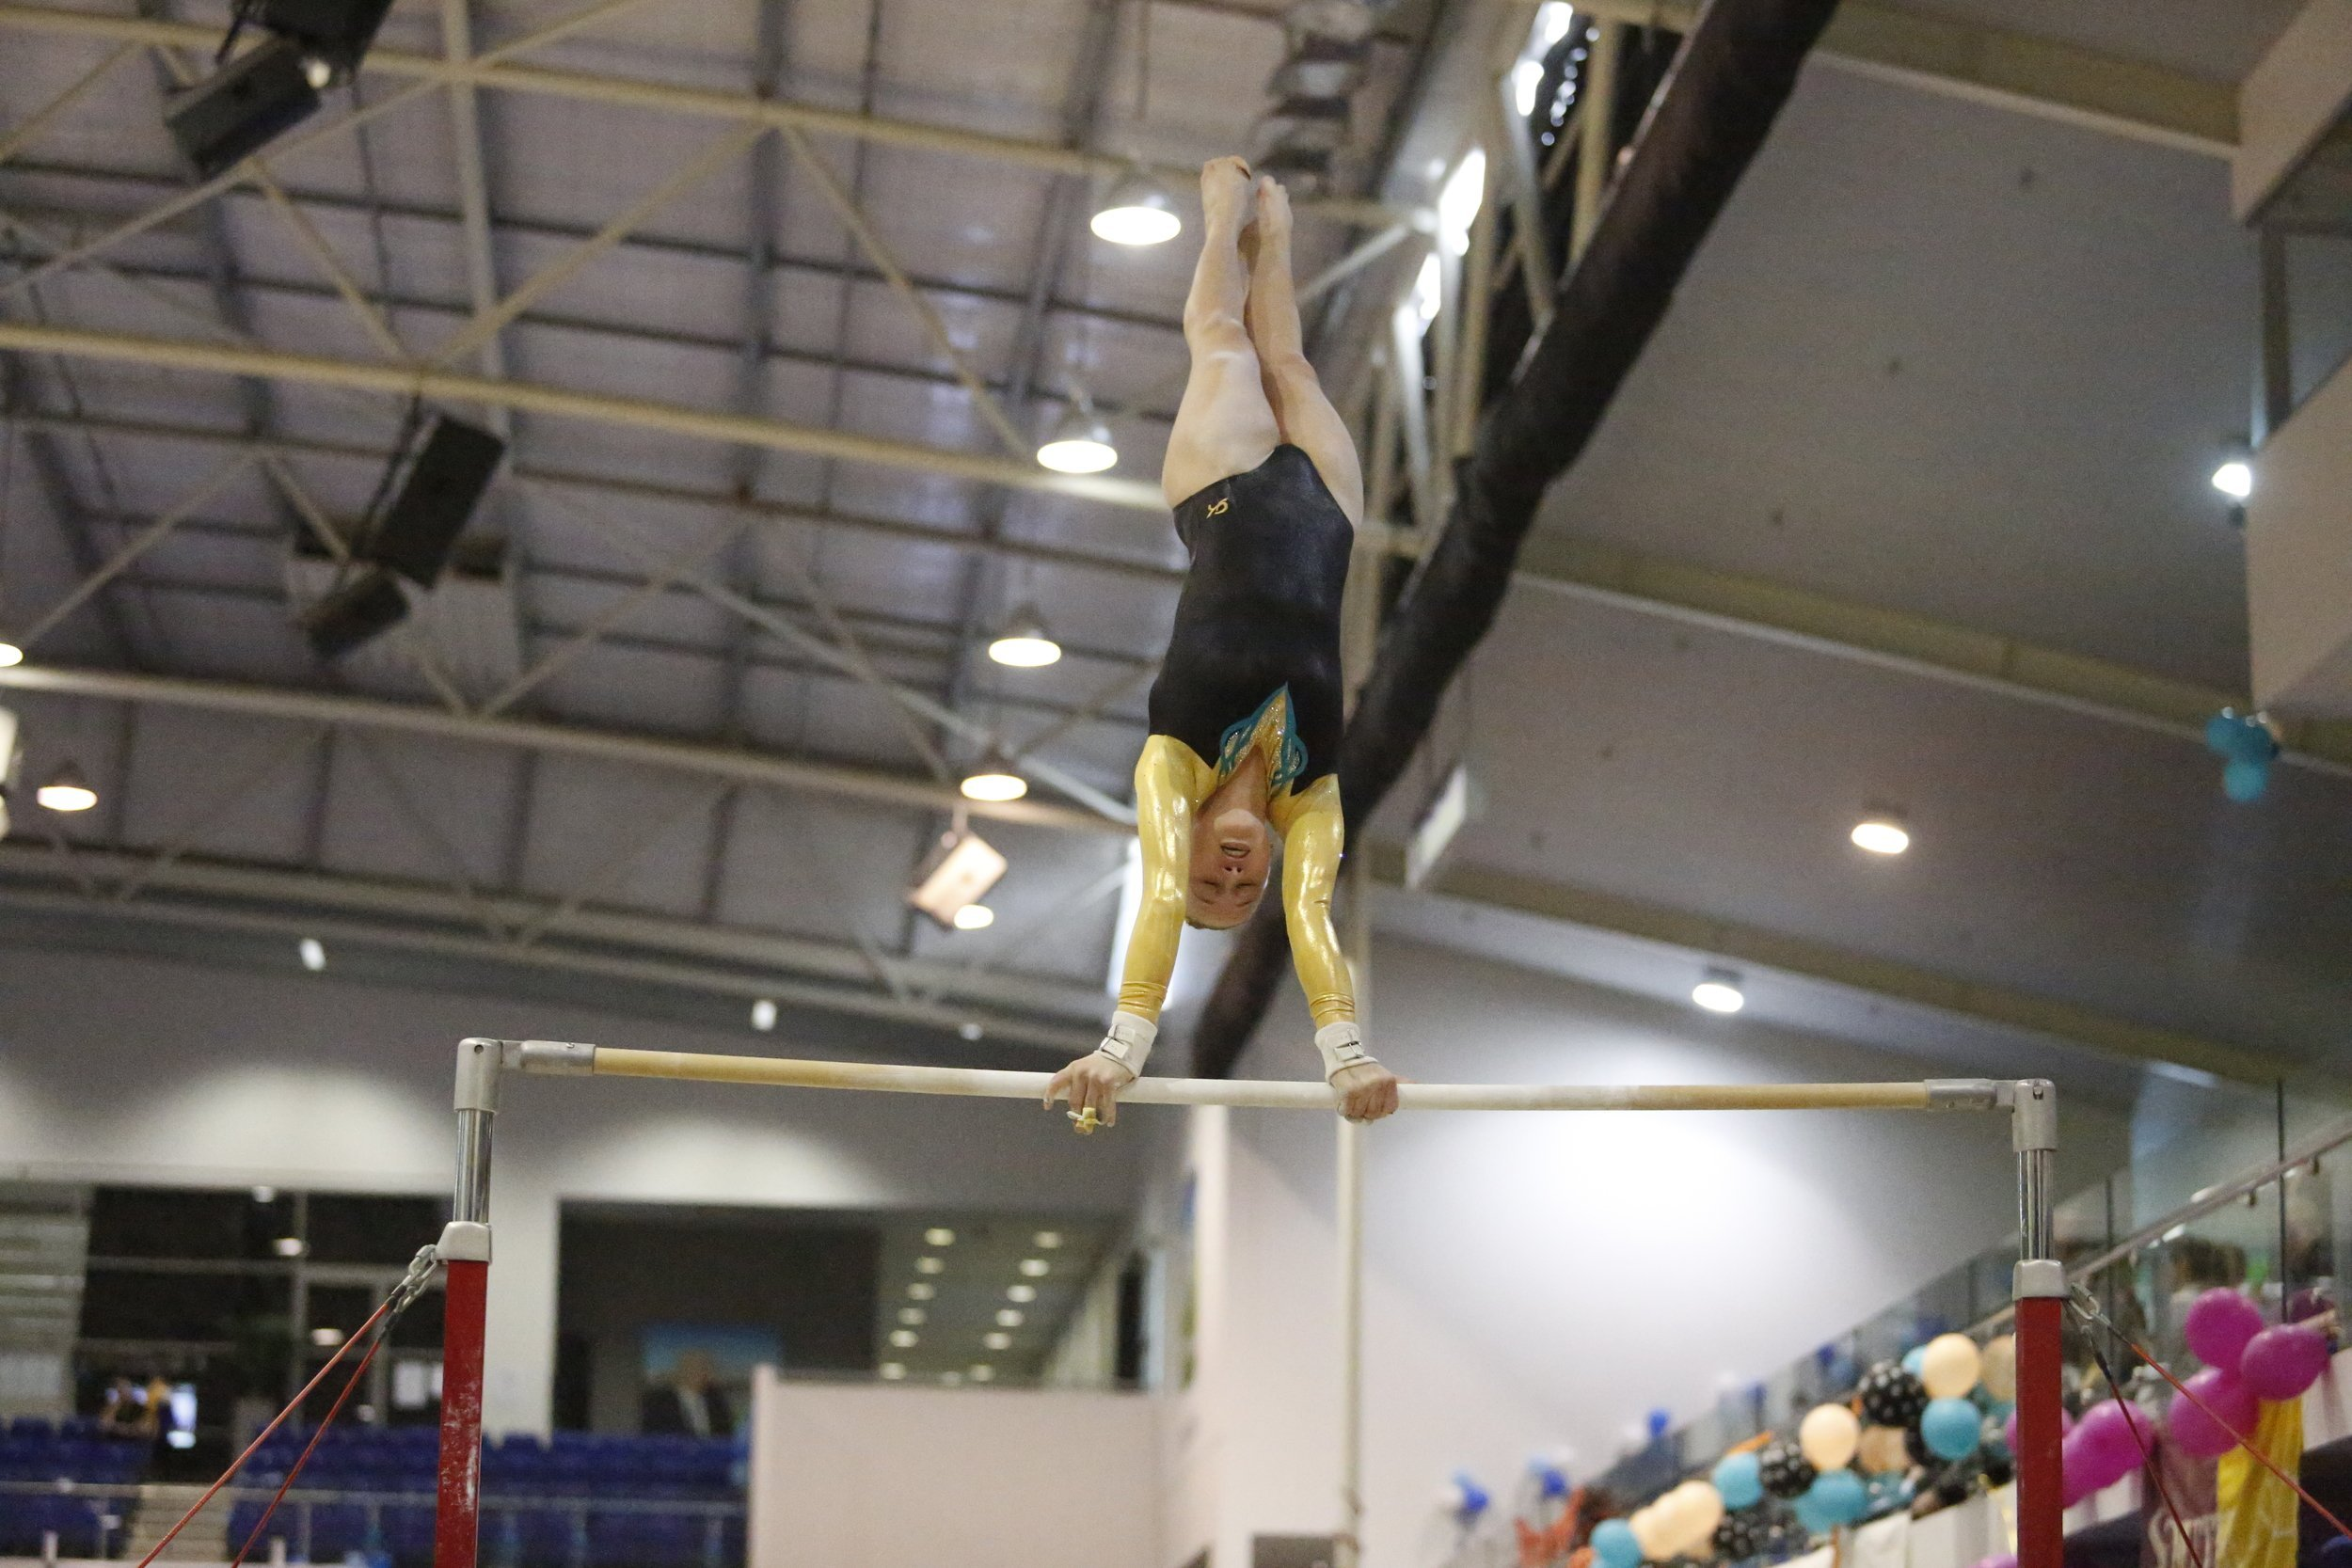 Indoor  Gymnastics Club training session